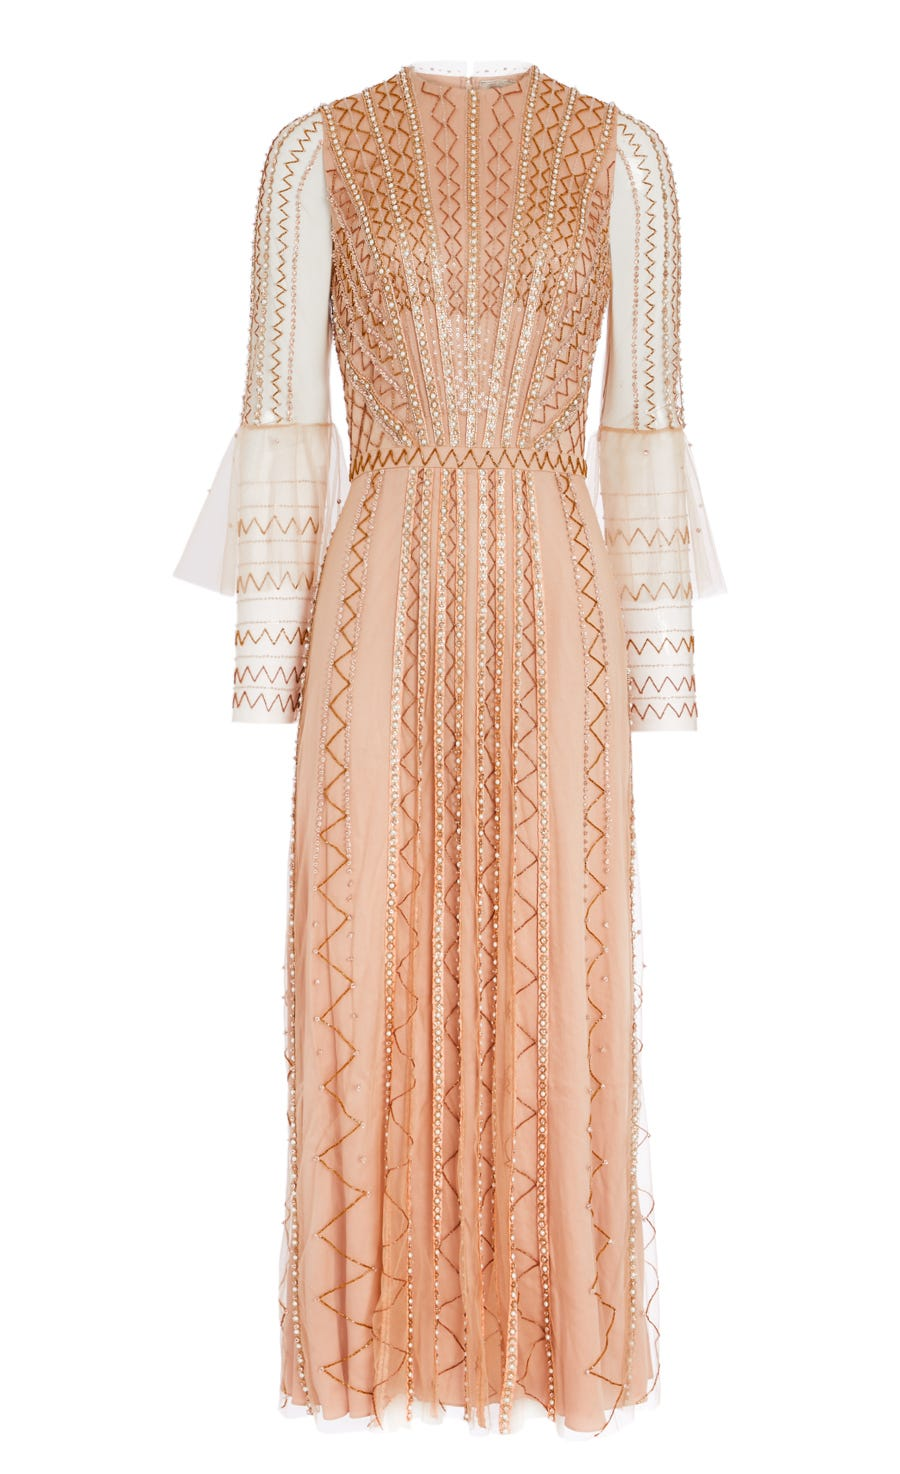 Queenie Tulle Dress